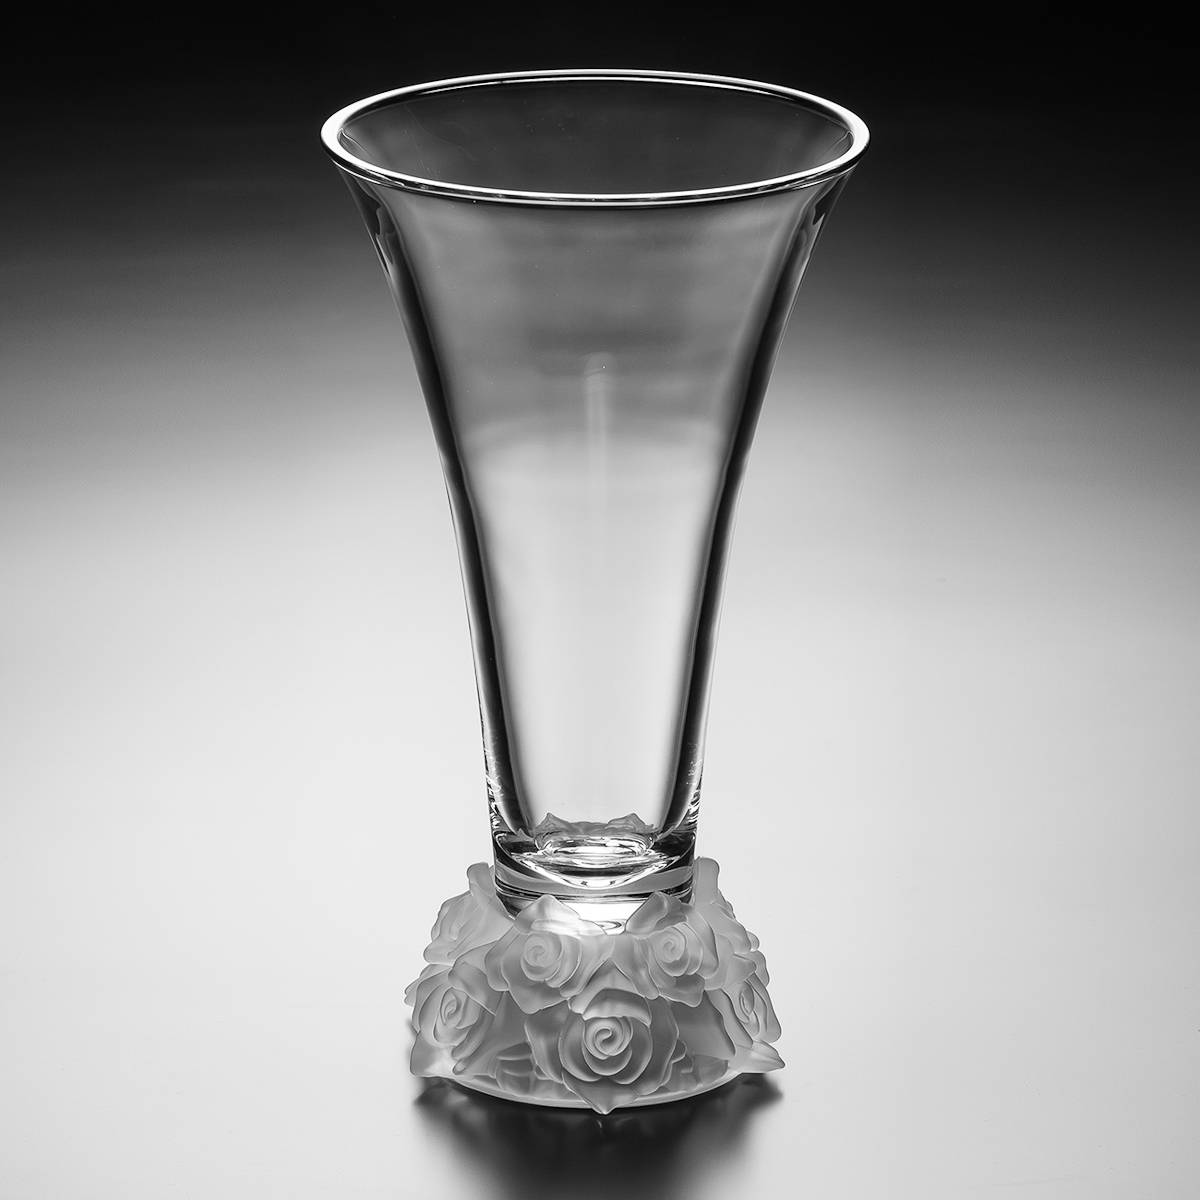 Vaso Rosê em Cristal - Bohemia Crystalite - 35,5 cm